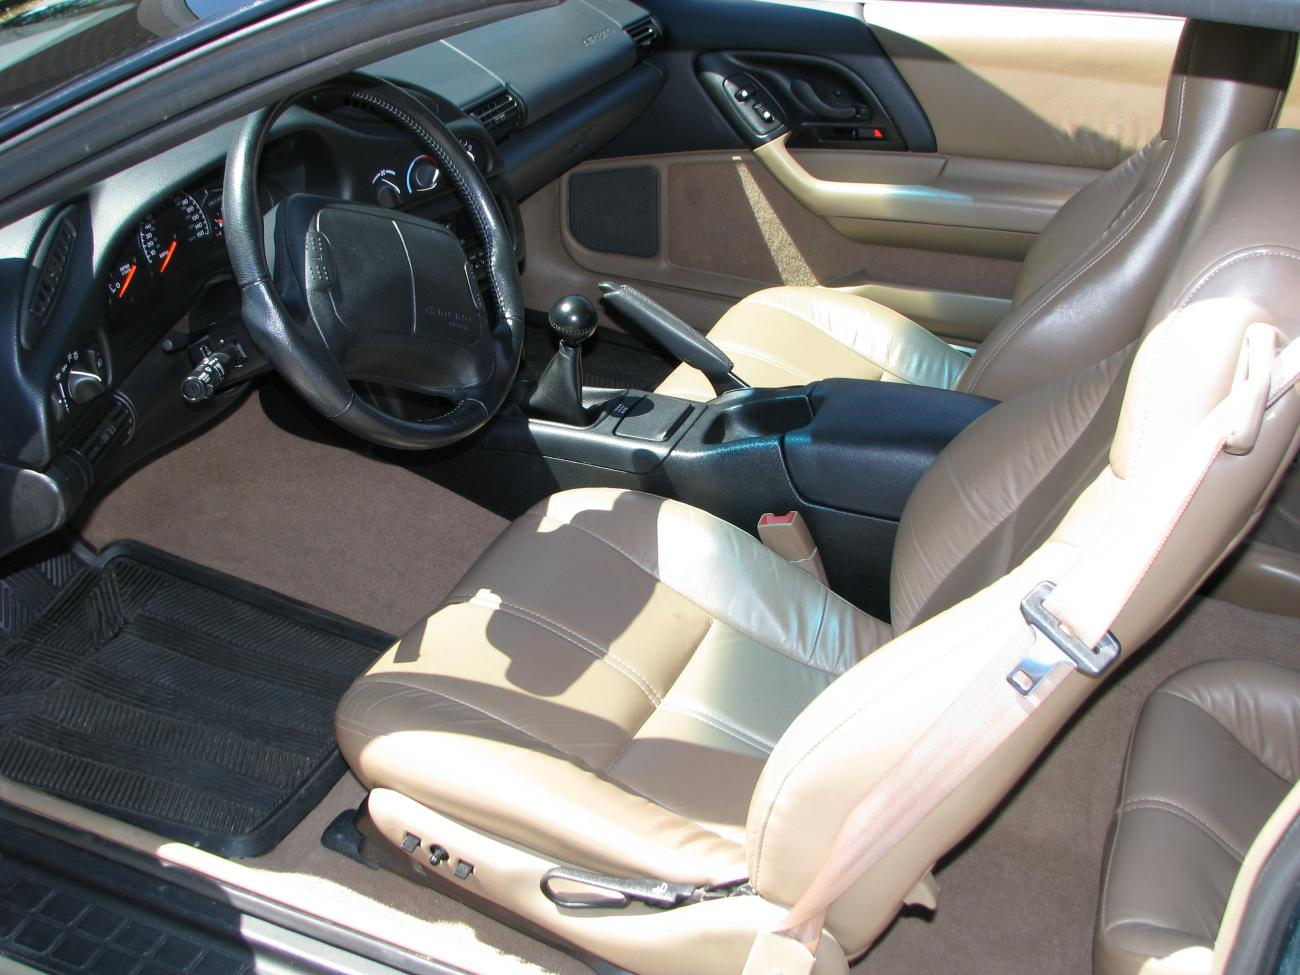 1995 Camaro Z28 For Sale 6500 Camaro5 Chevy Camaro Forum Camaro Zl1 Ss And V6 Forums